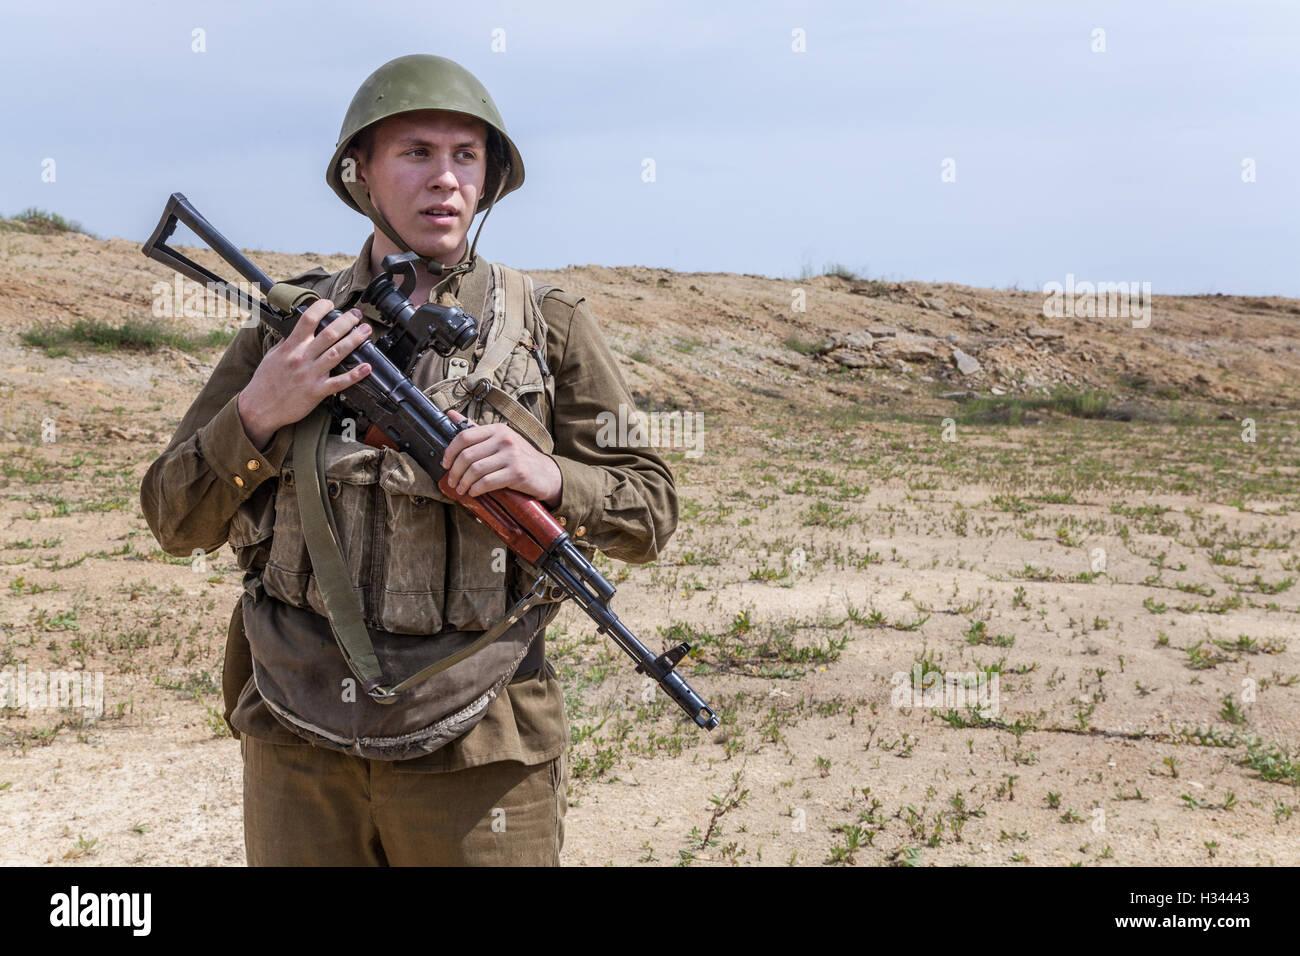 Soviet Afghanistan war - Page 6 Soviet-paratrooper-in-afghanistan-H34443